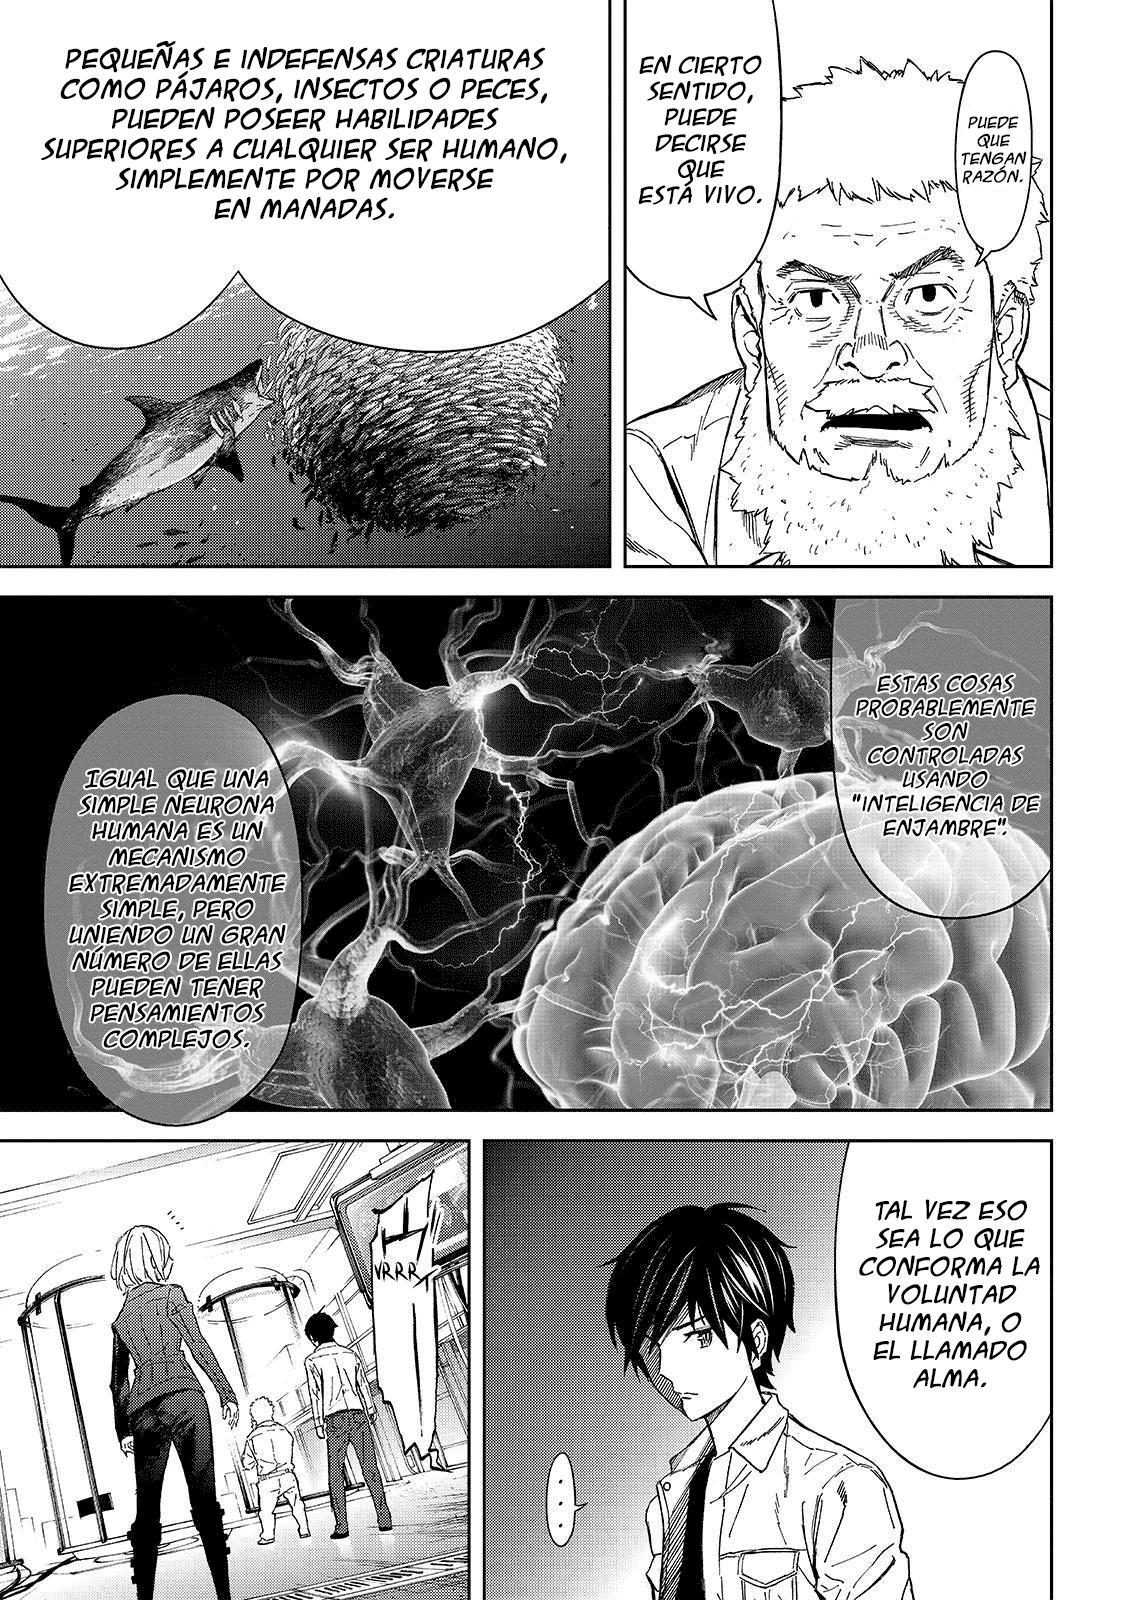 http://c5.ninemanga.com/es_manga/54/16310/435442/62daa6b4f9bea3349e4a3288e2c6f33f.jpg Page 6